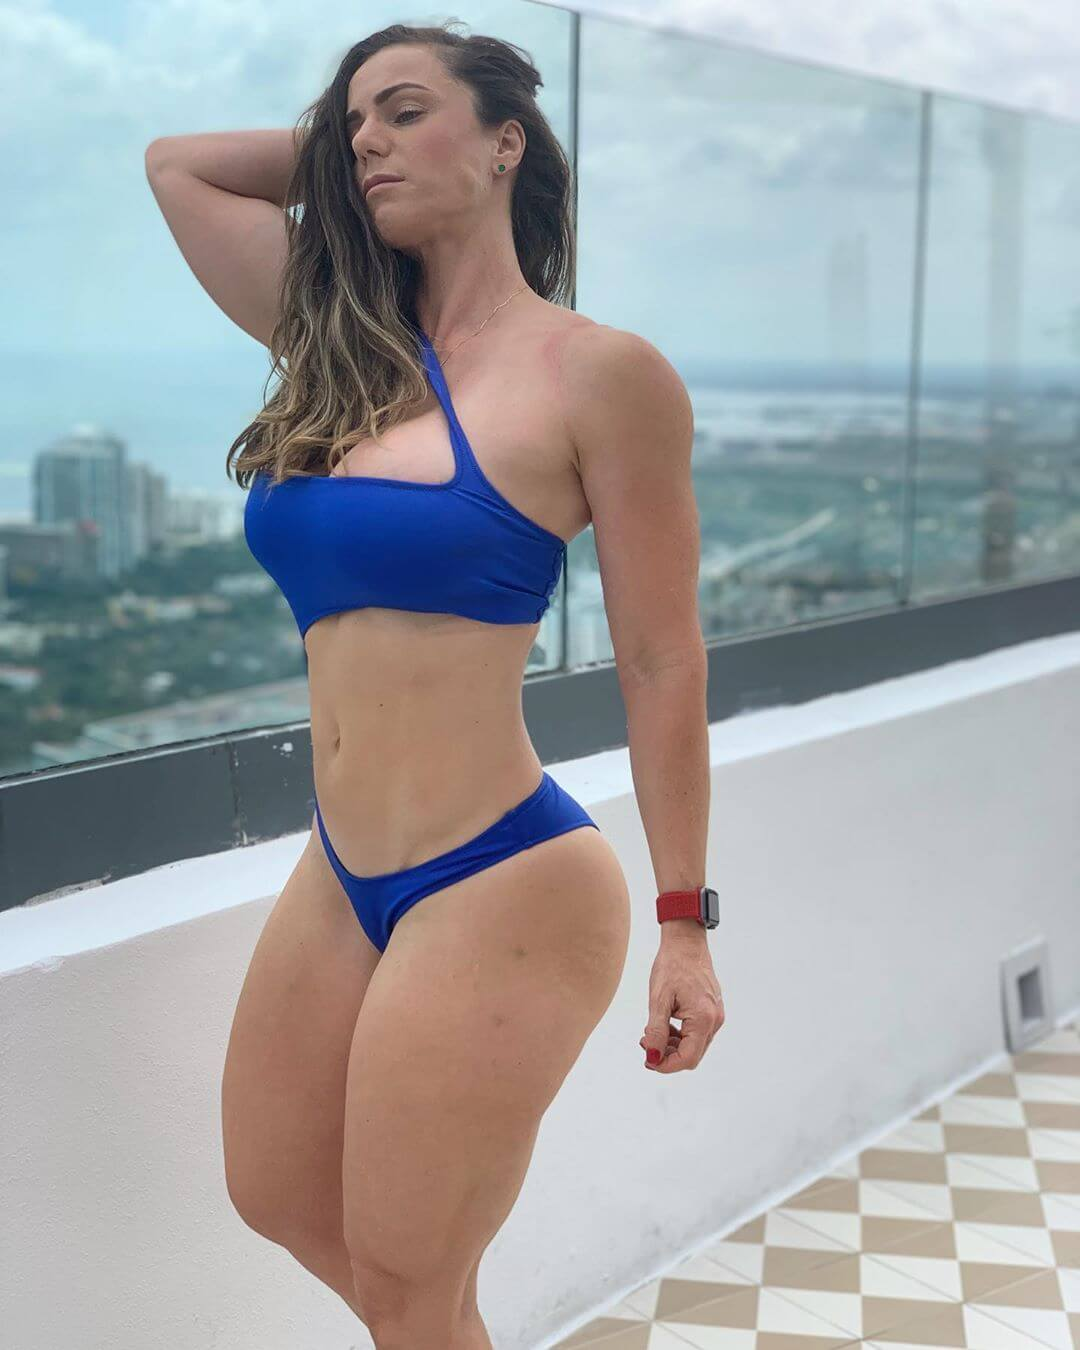 Linda Durbesson hot pics